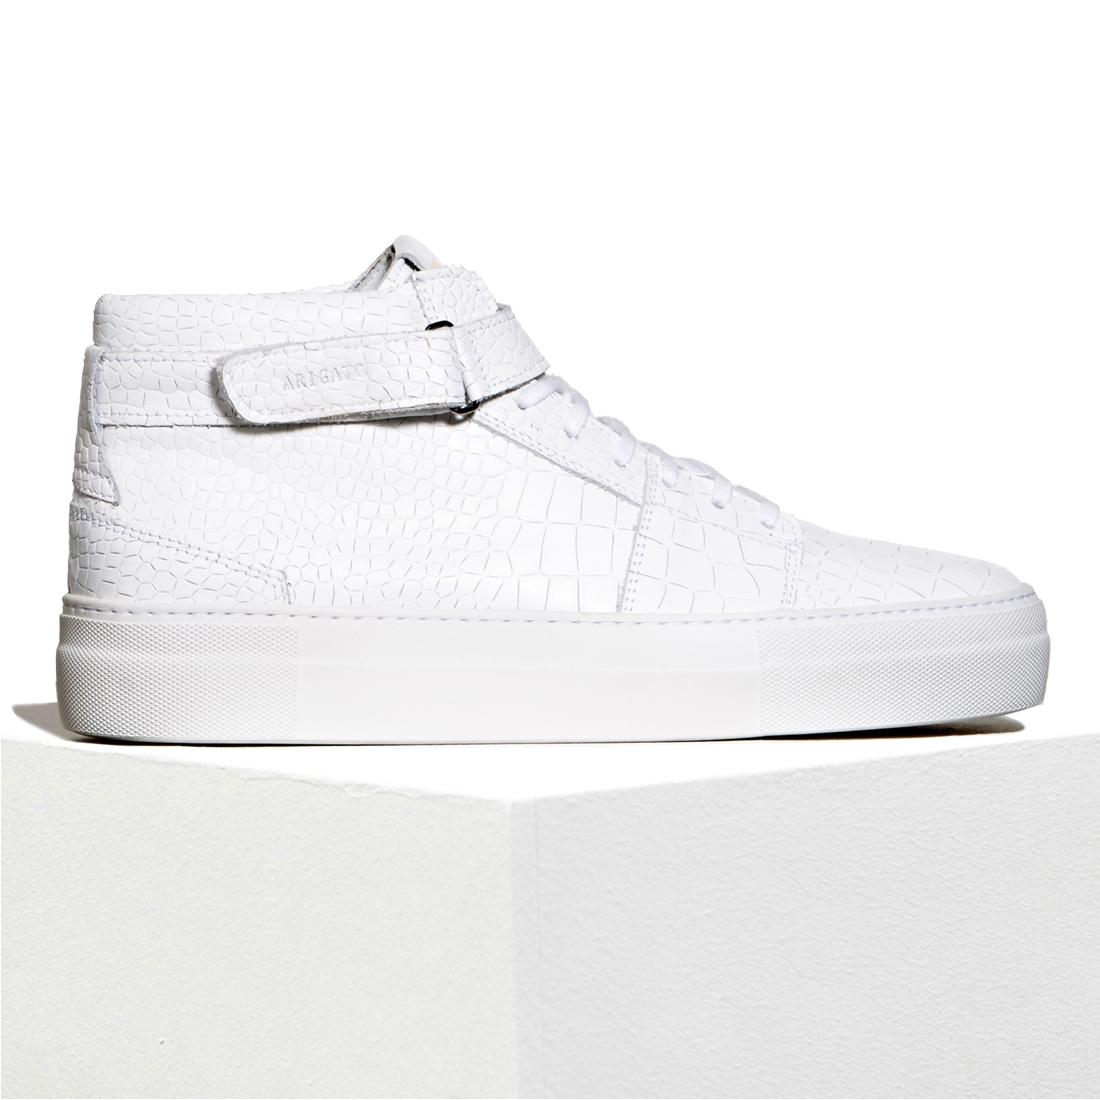 cayman-white-2